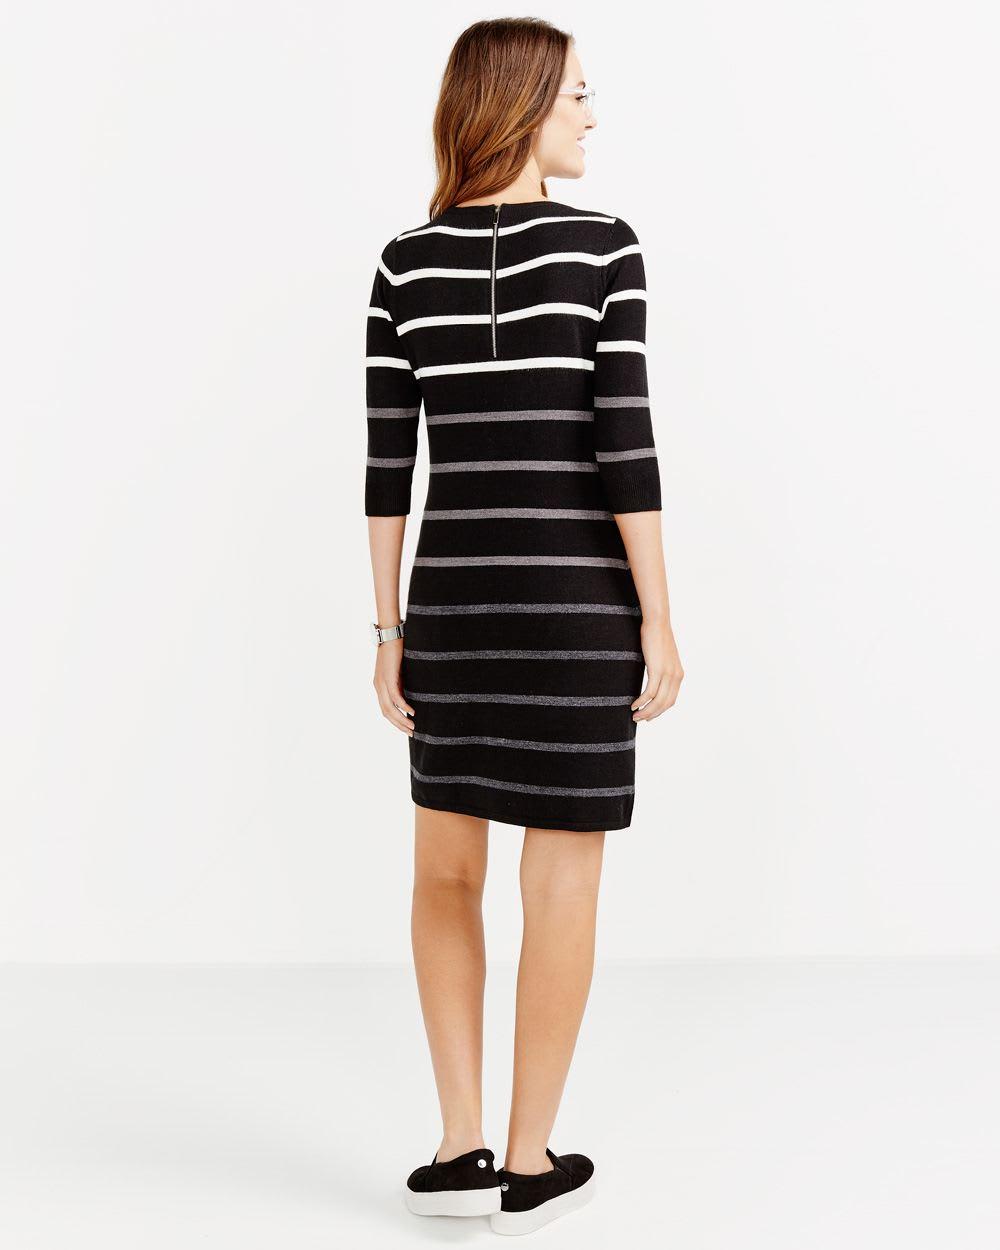 ¾ Sleeve Striped Dress